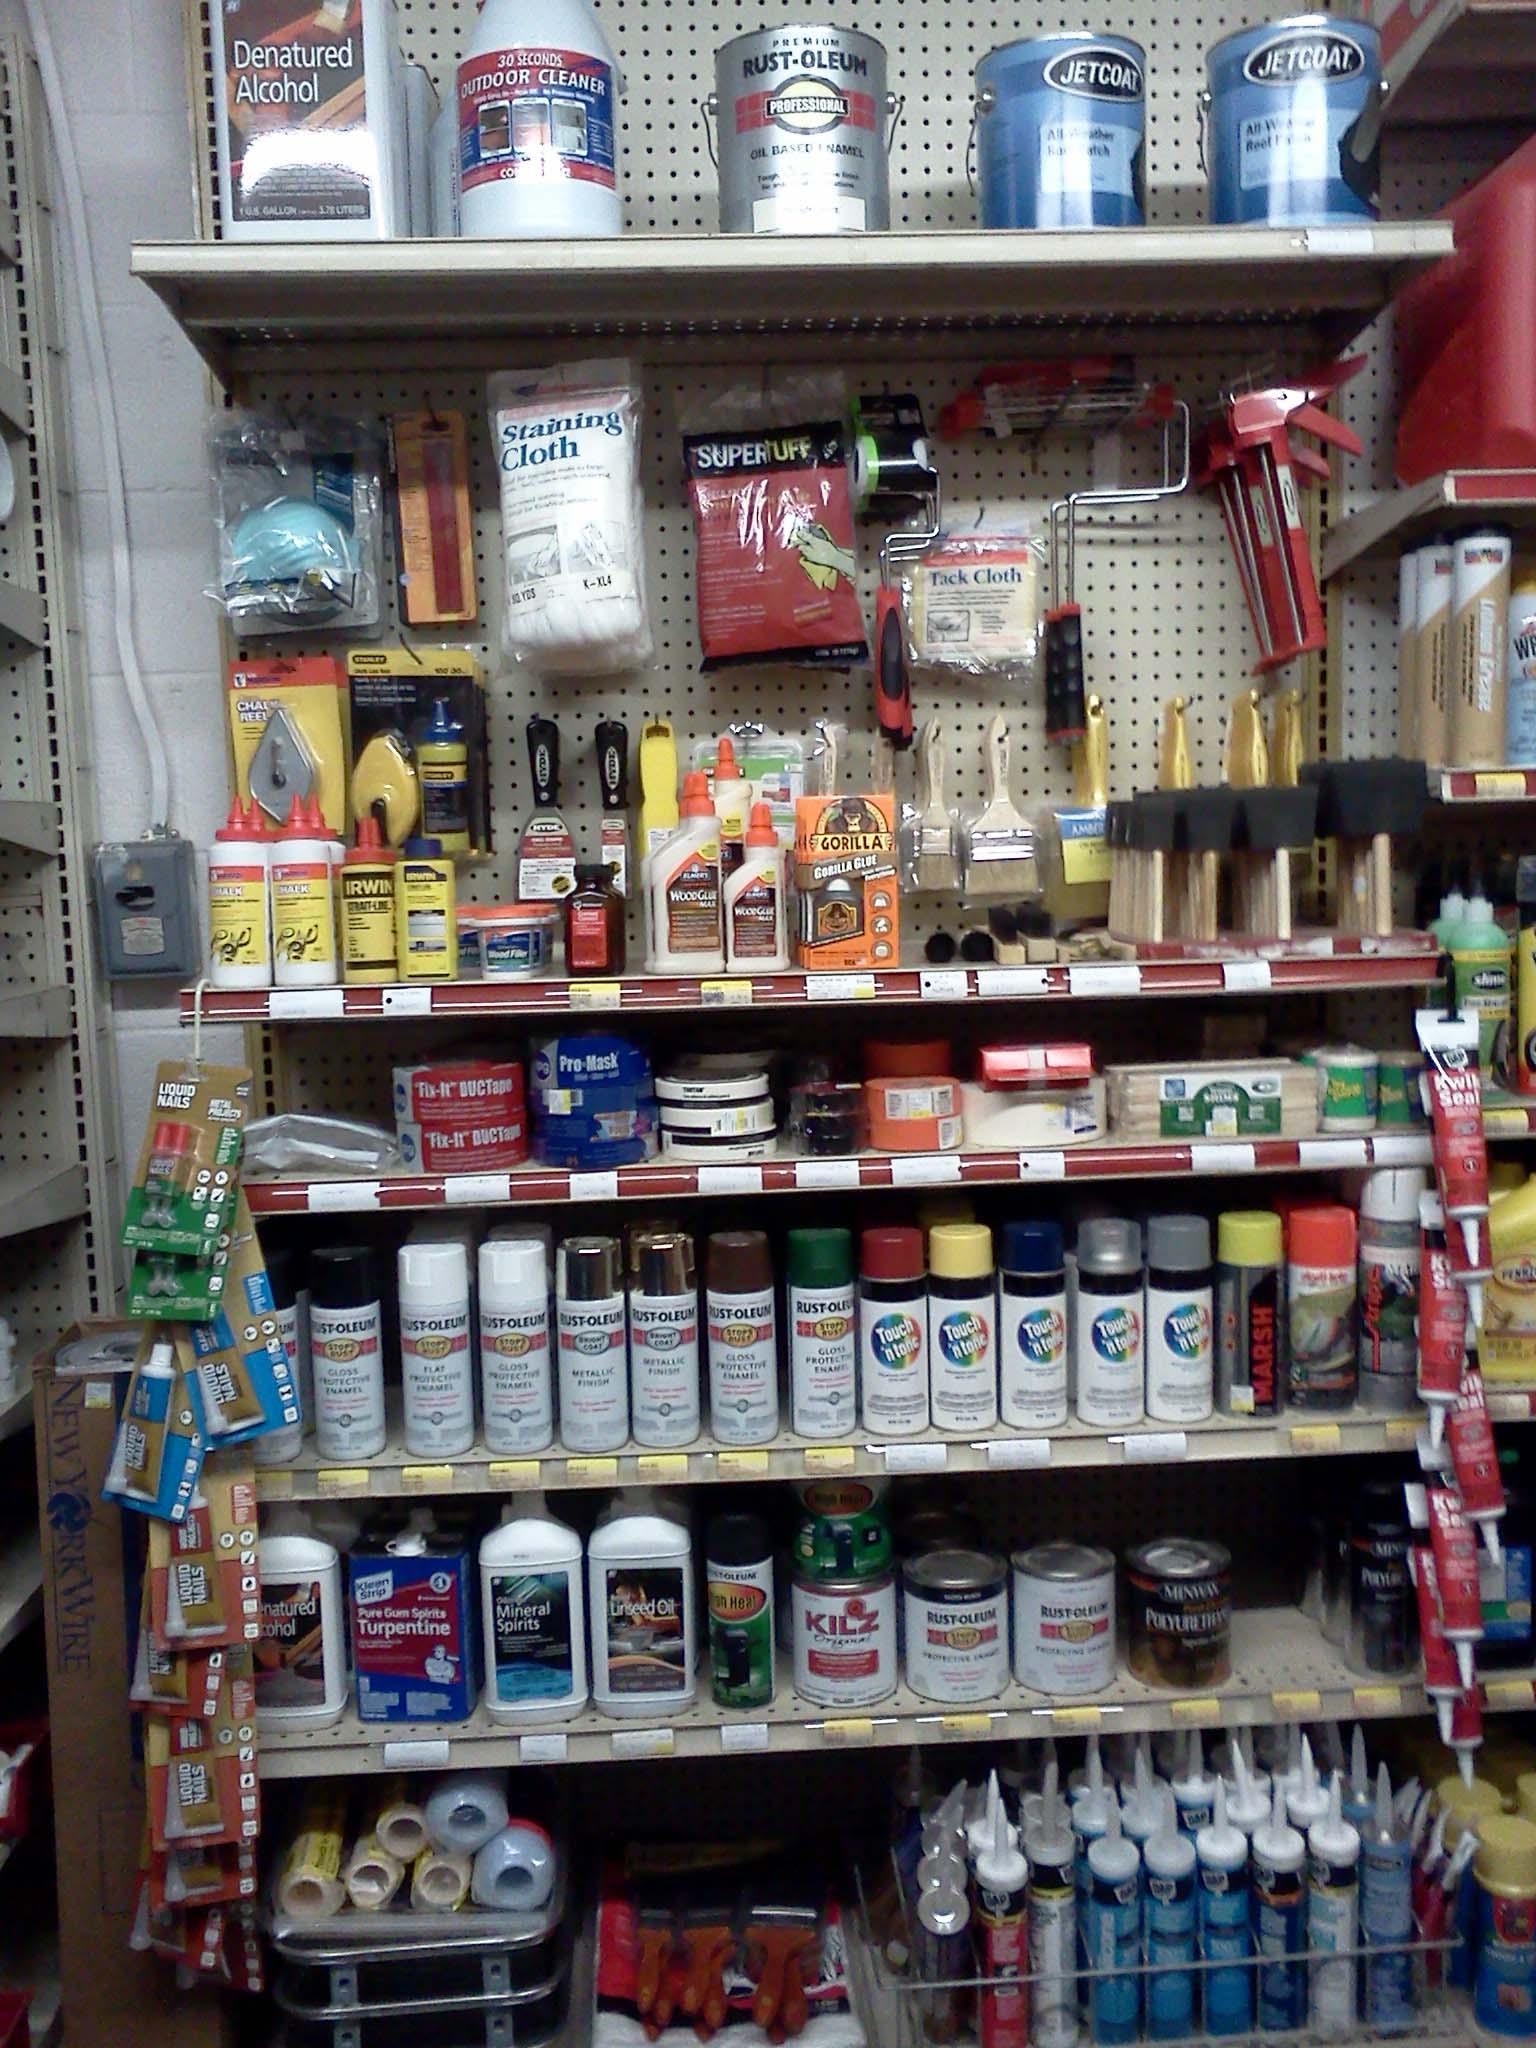 tapes, adhesives, painting supplies